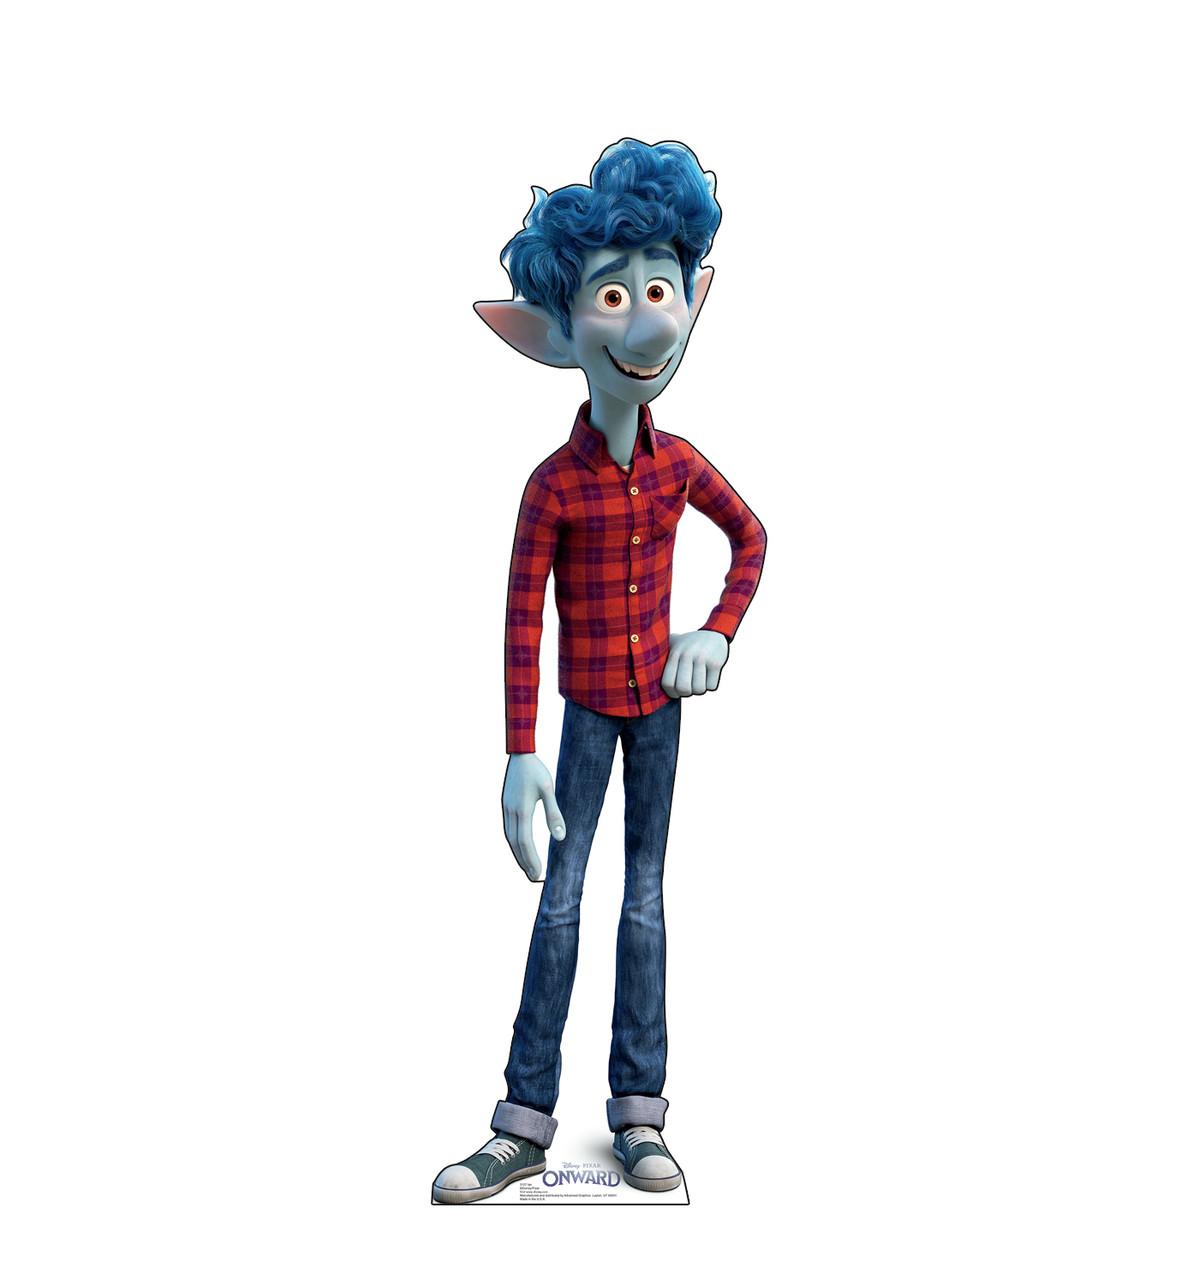 Life-size cardboard standee of Ian from Disney/Pixar's film Onward.